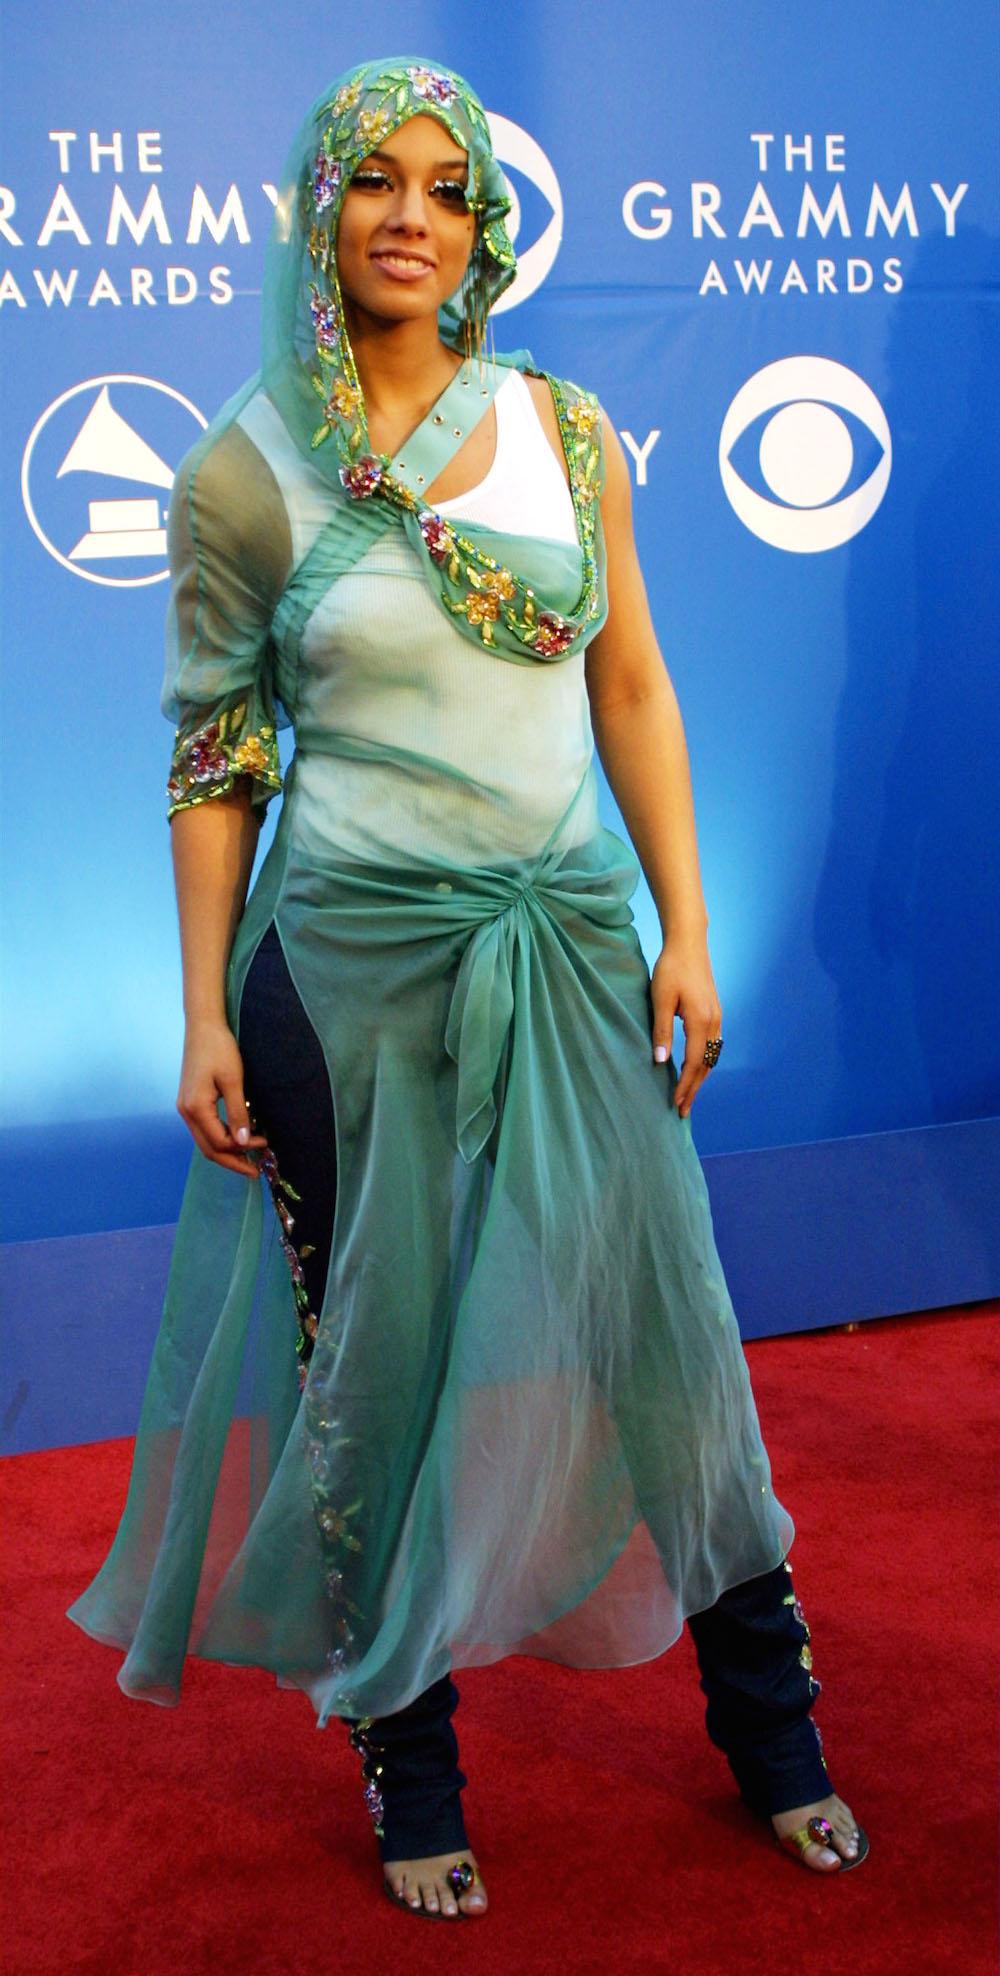 Grammy Awards 2019: les looks marquants d'Alicia Keys